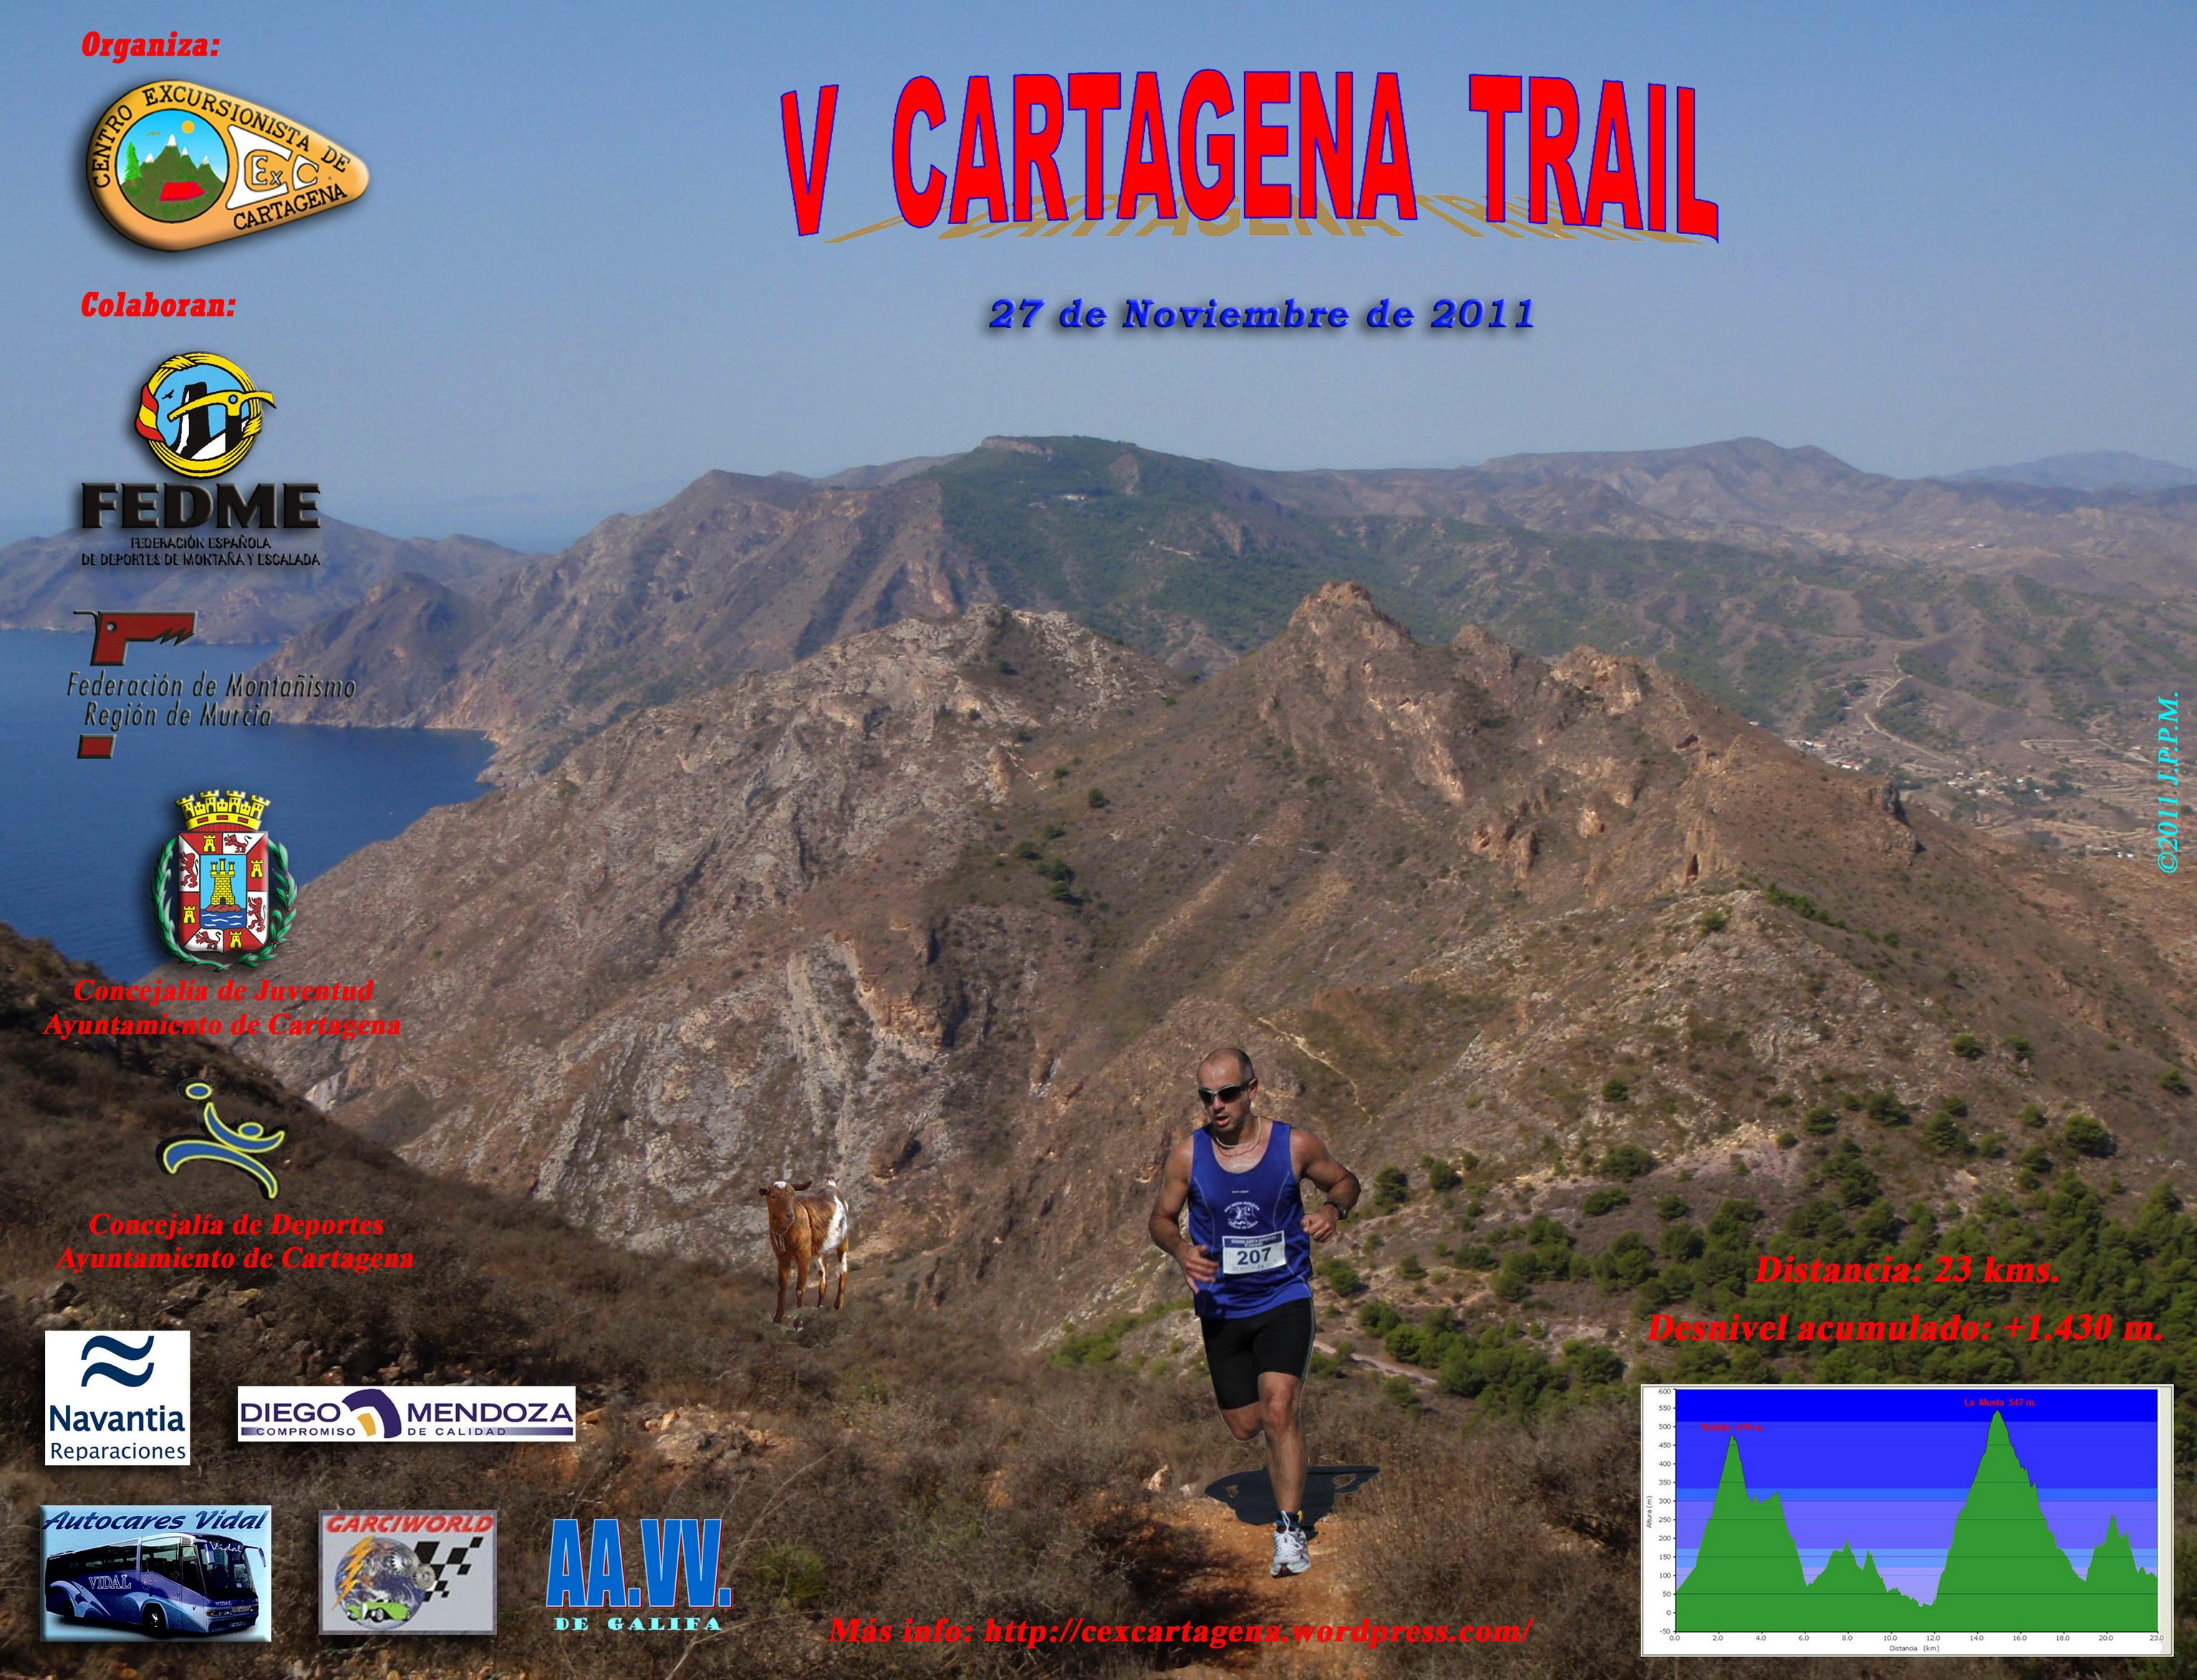 V Cartagena Trail